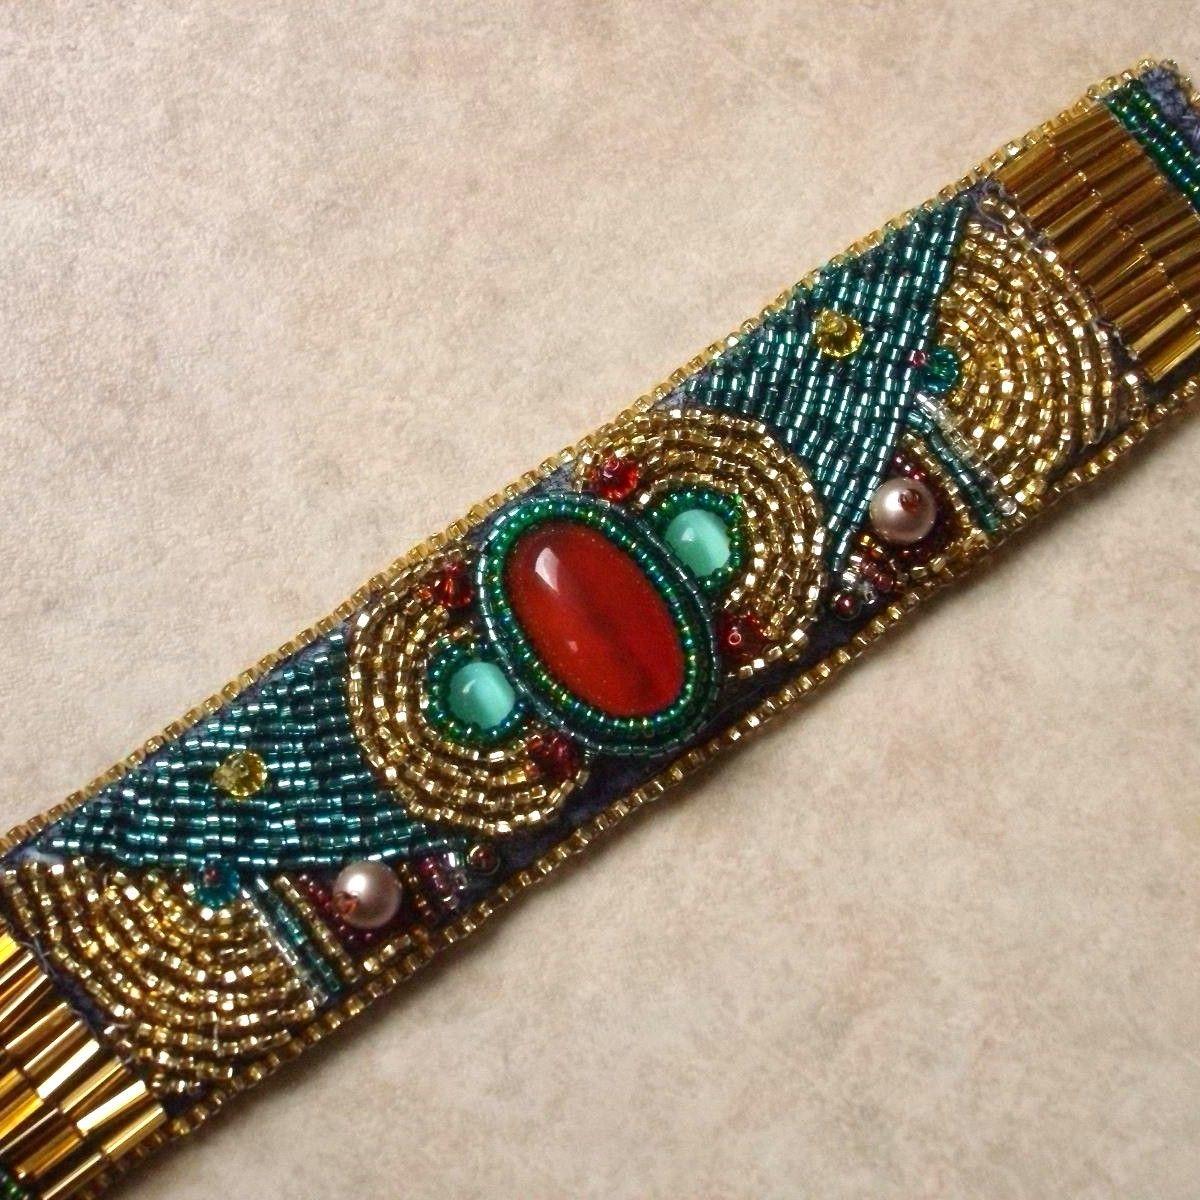 Embroidered Cuffs Abaya